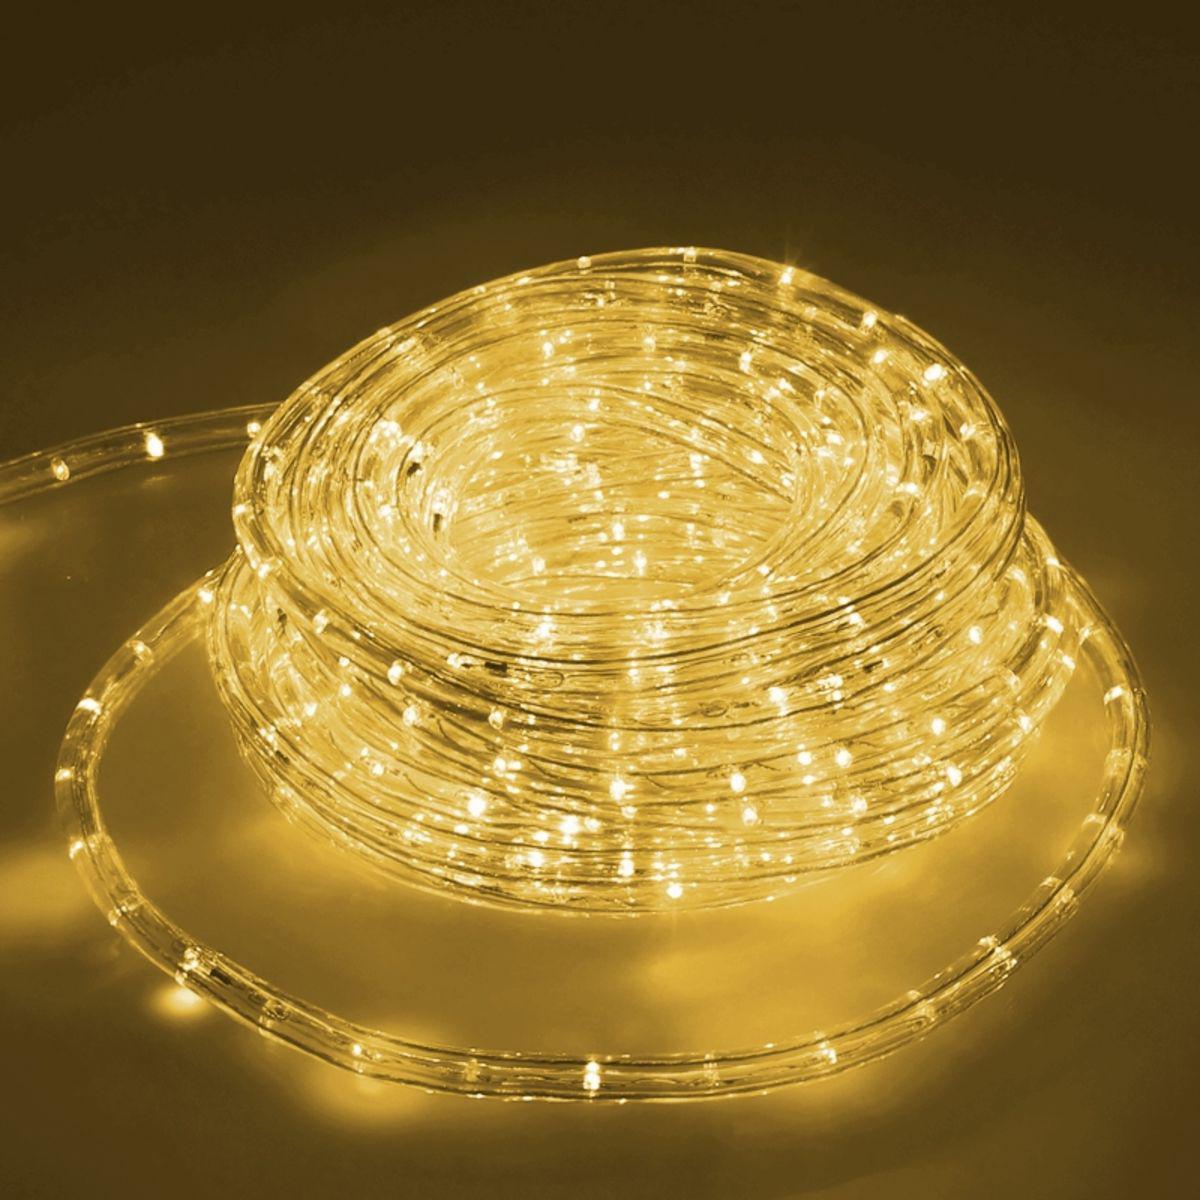 Ecd Germany ECD Germany LED Tube Lumière Guirlande 10m - 12W AC - 220-240V - Blanc chaud 3000K - 791 Lumens - Bandes de LED de Noël